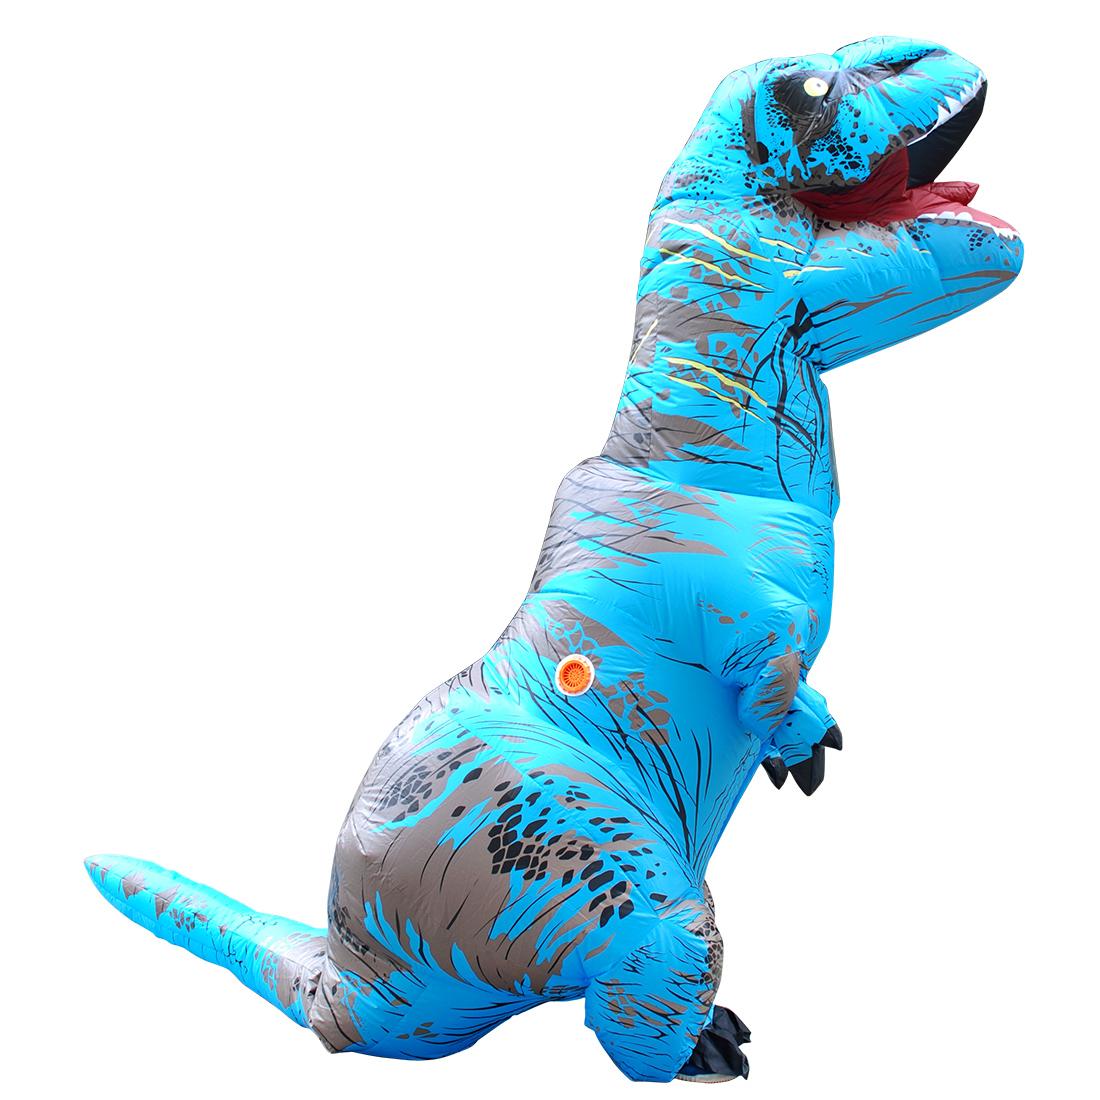 Carnival Erwachsene Blau T-REX Aufblasbar Dinosaurier Kostüm Jumpsuit Halloween Faschingskostüme